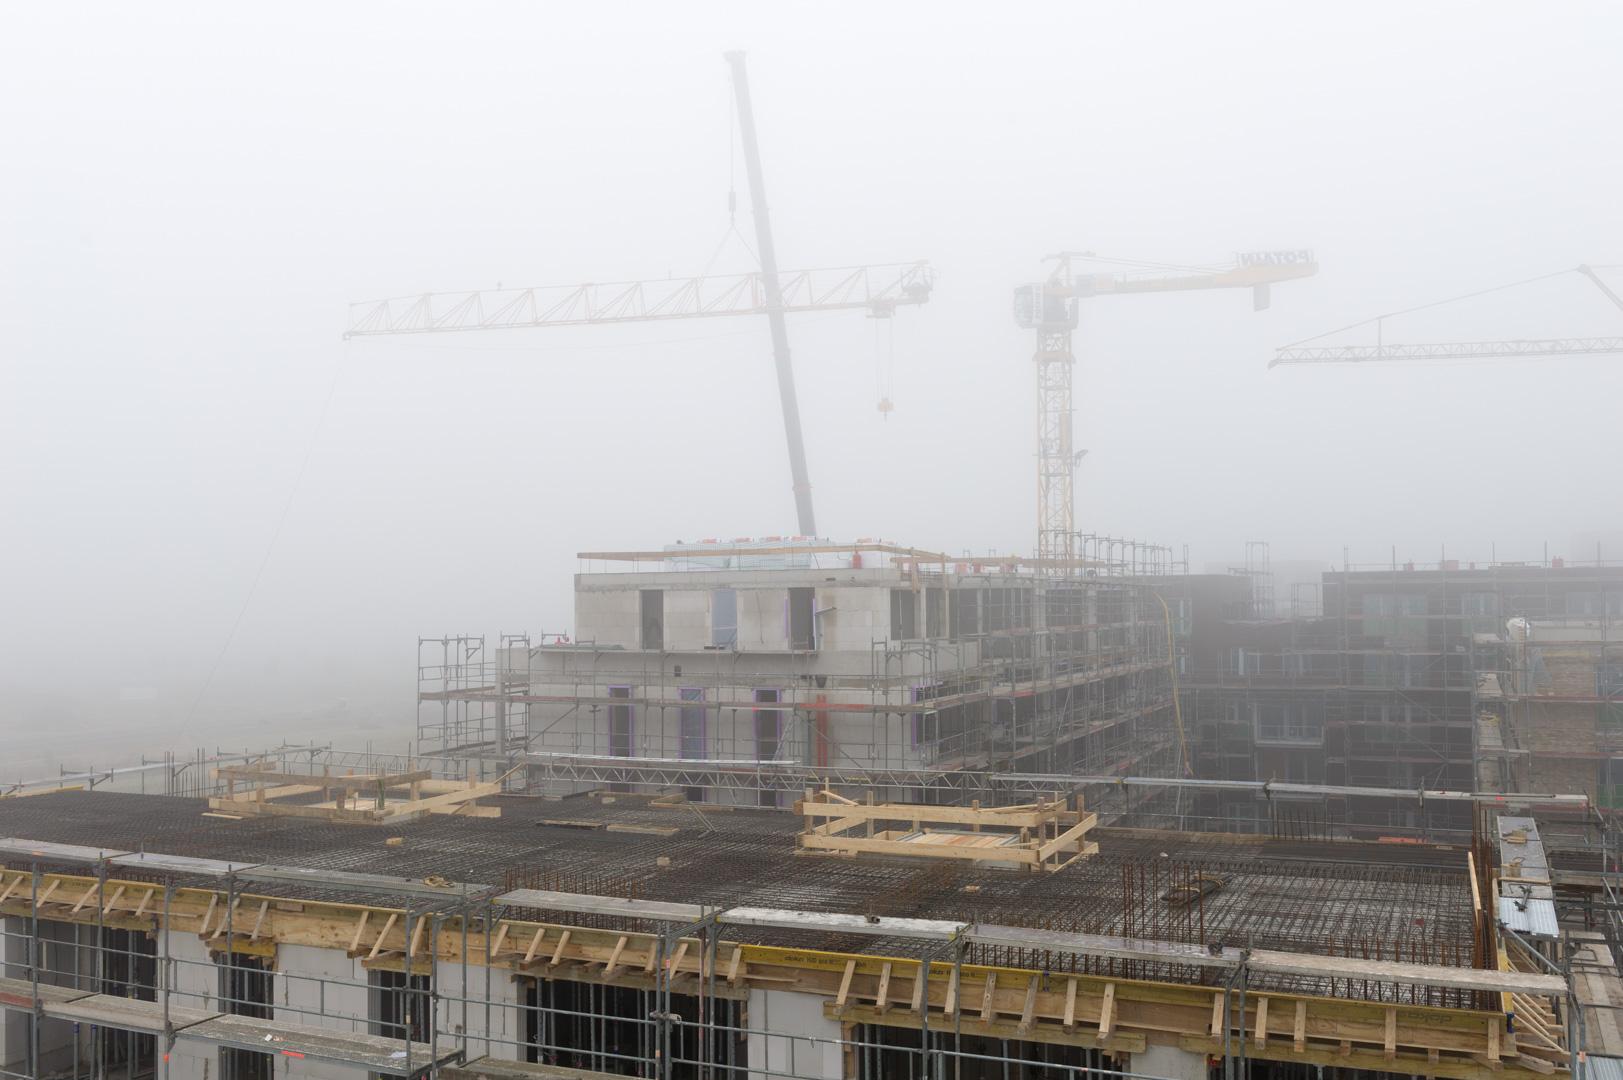 Construction site Bremen Magellan district in the fog